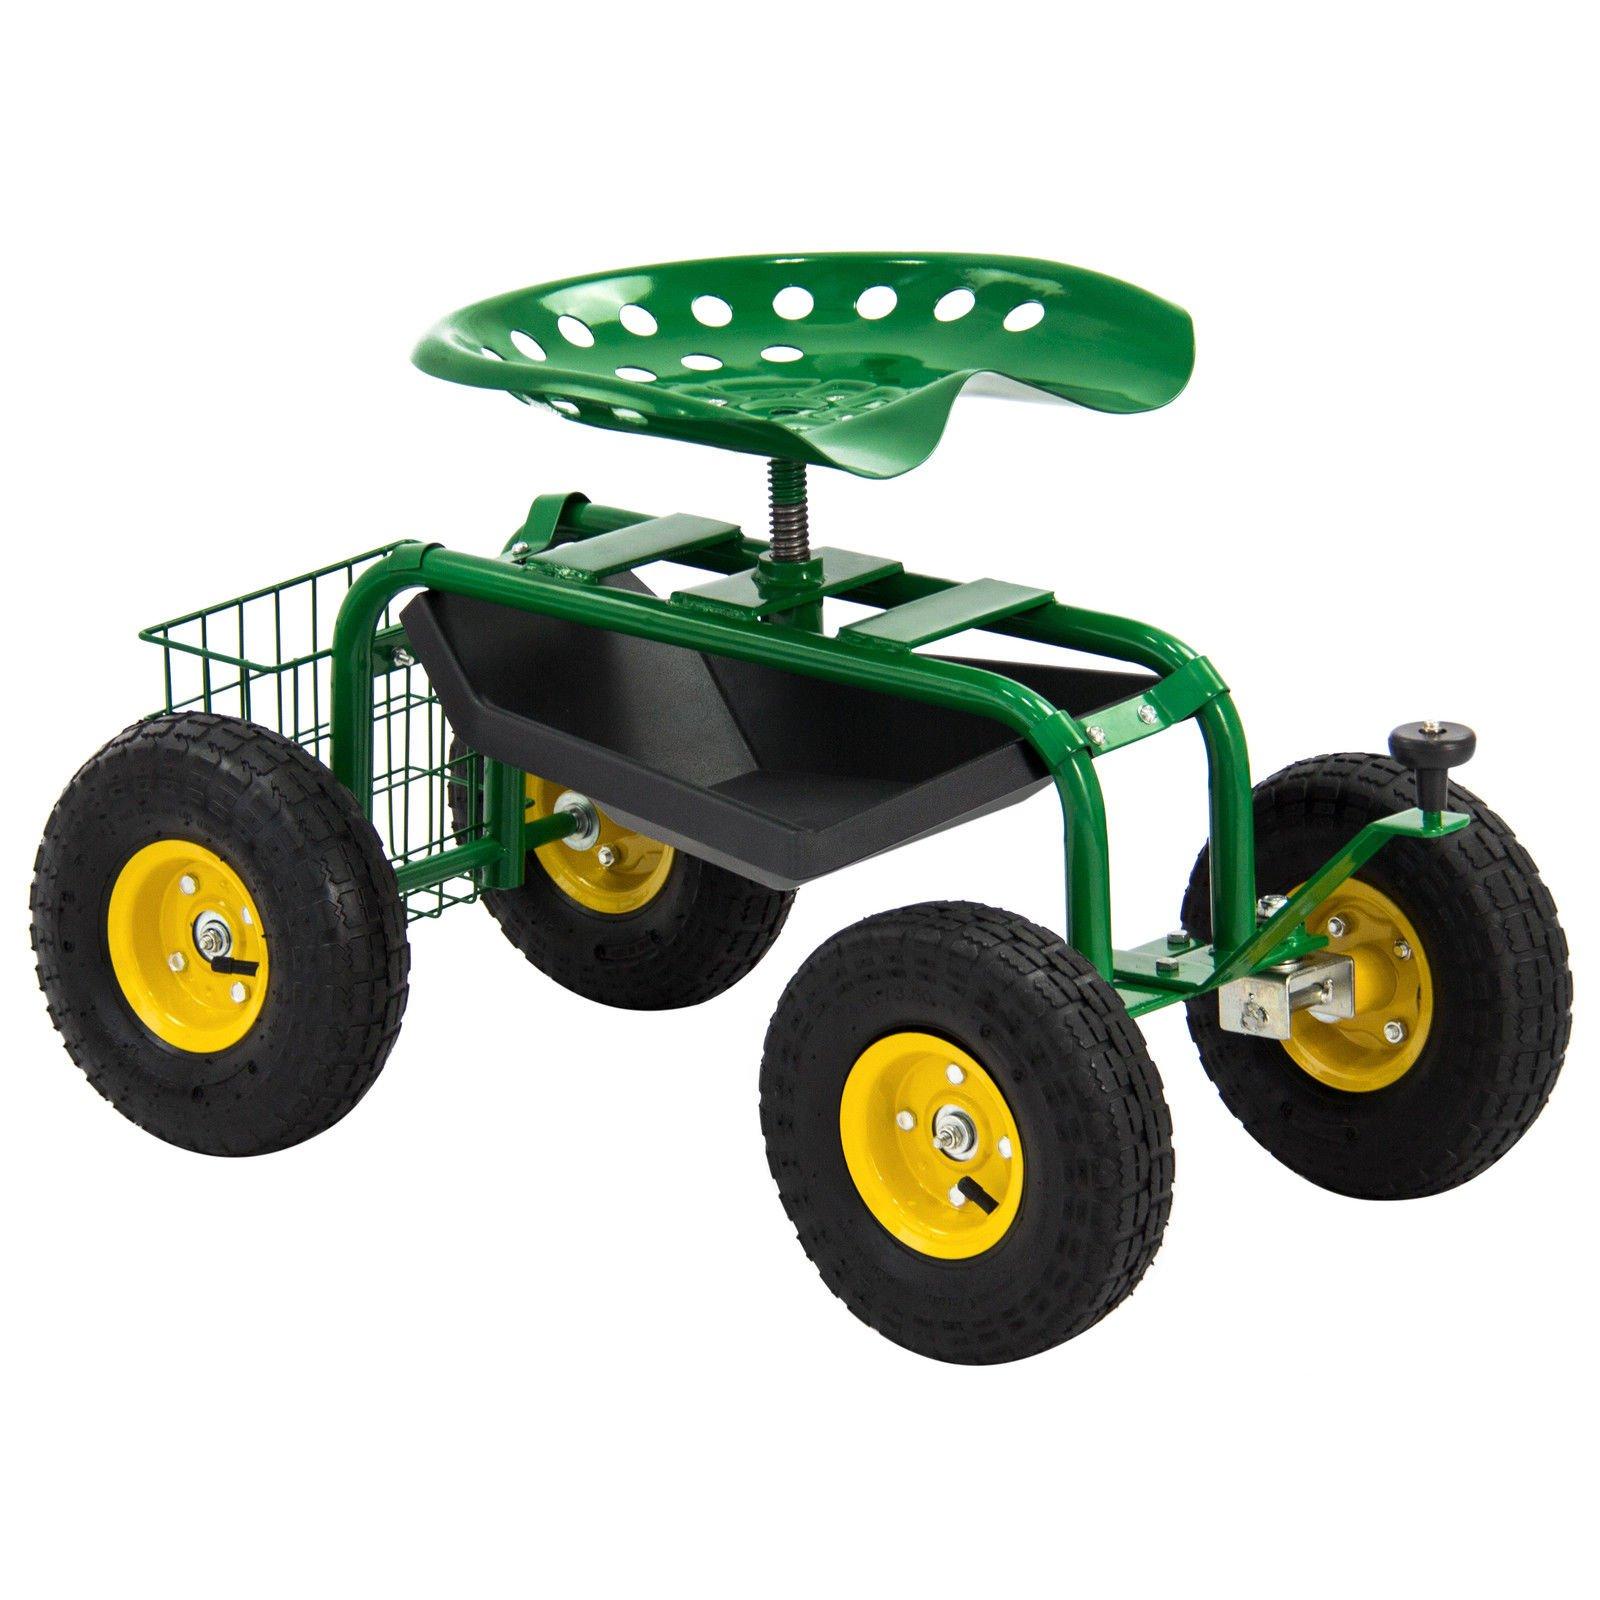 NEW Folding Garden Kneeler Knee Pad Support Seat Bench Ergonomic Garden Tool Green